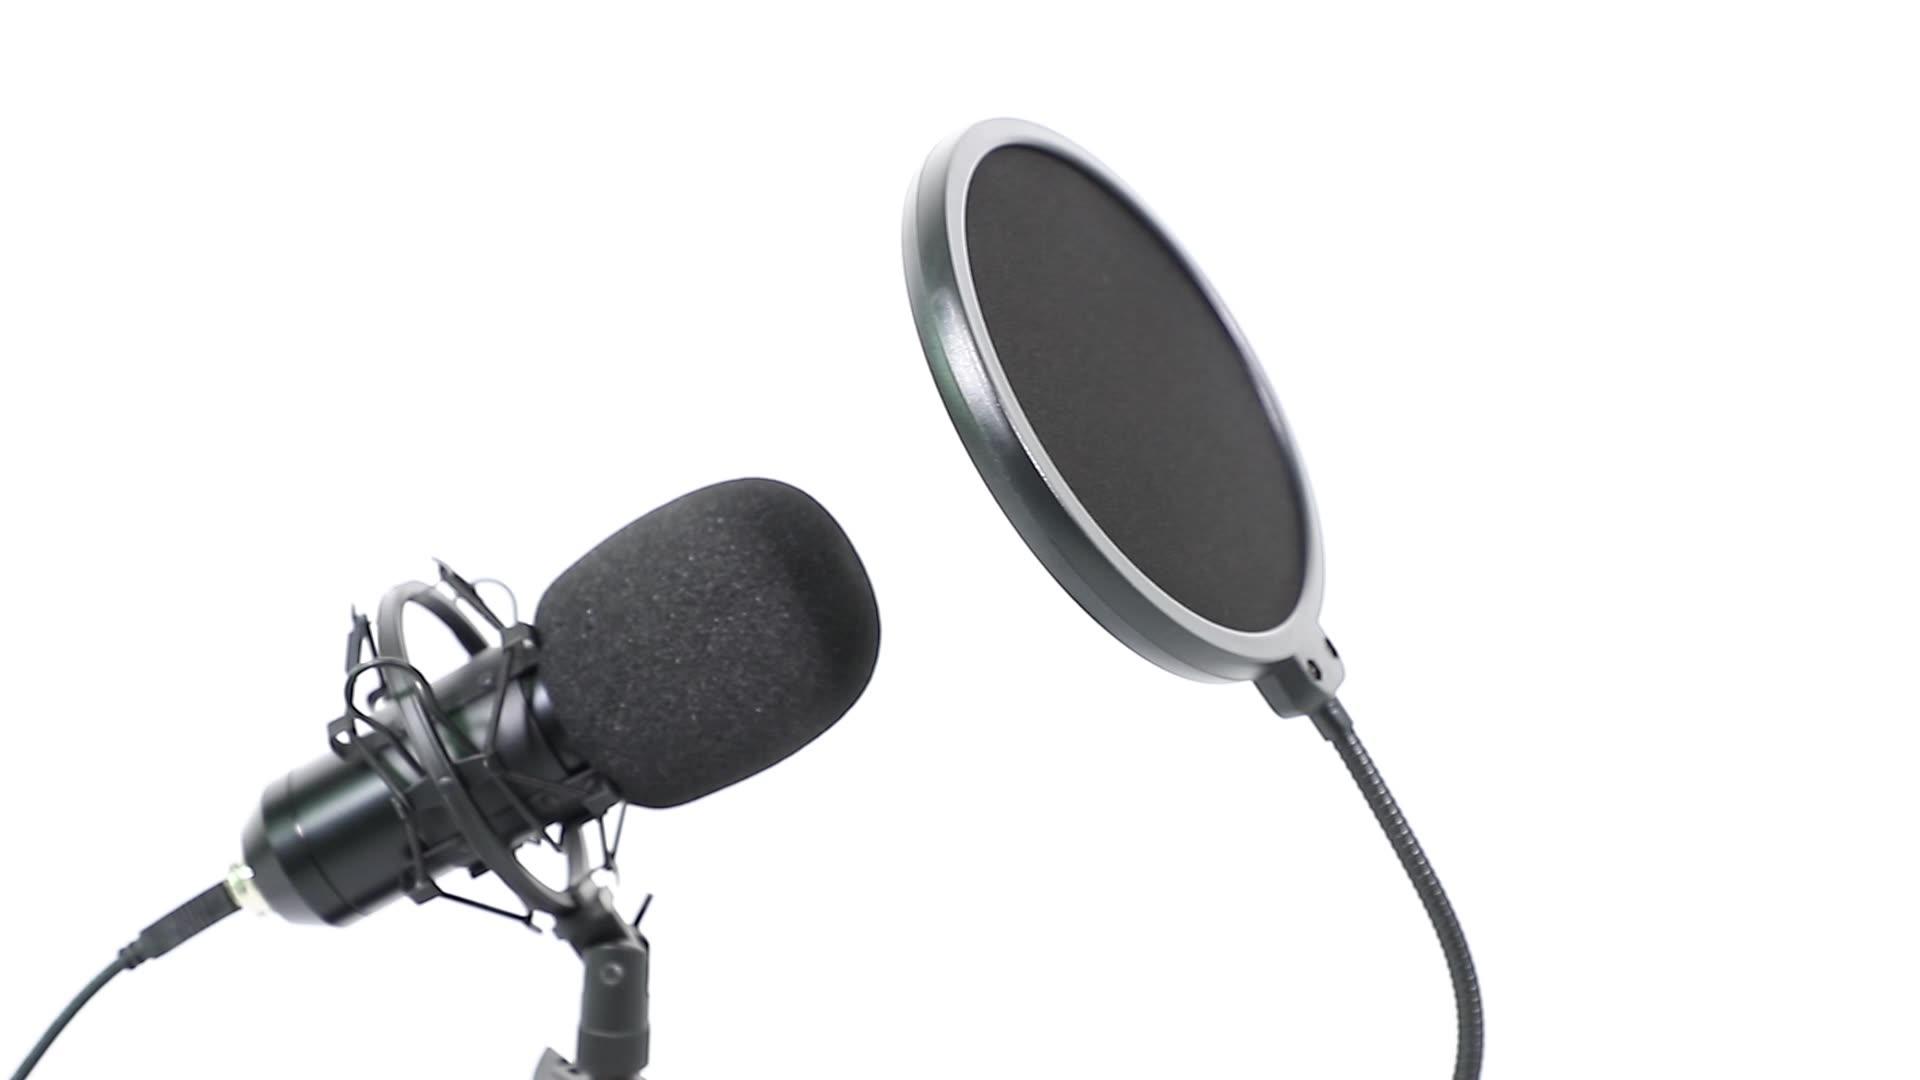 BM 800 Karaoke Condenser Microphone Bundle Professional Cardioid Studio BM800 Microfone Sound Recording broadcasting Singing Mic